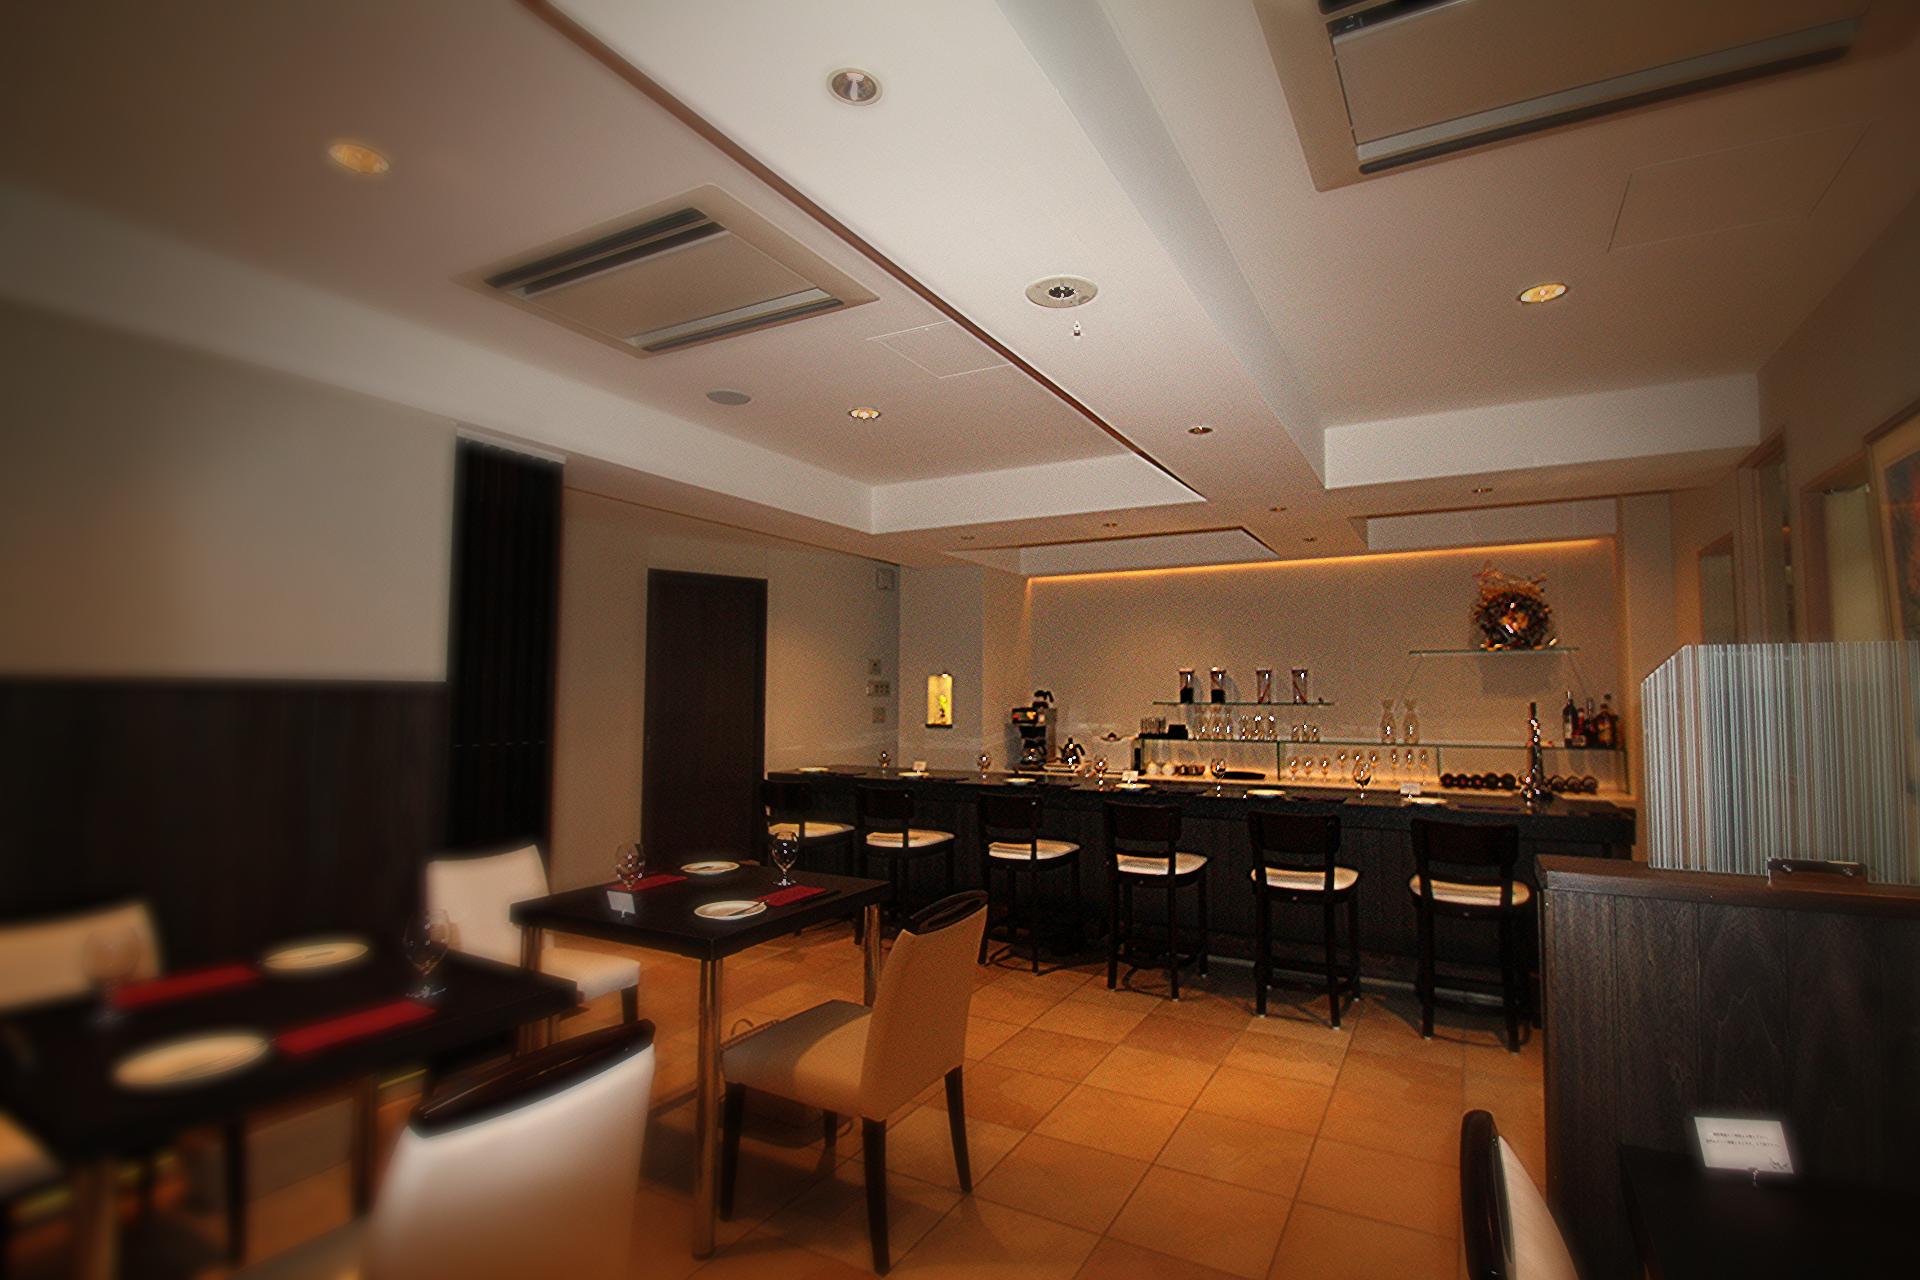 Fuji/restaurant